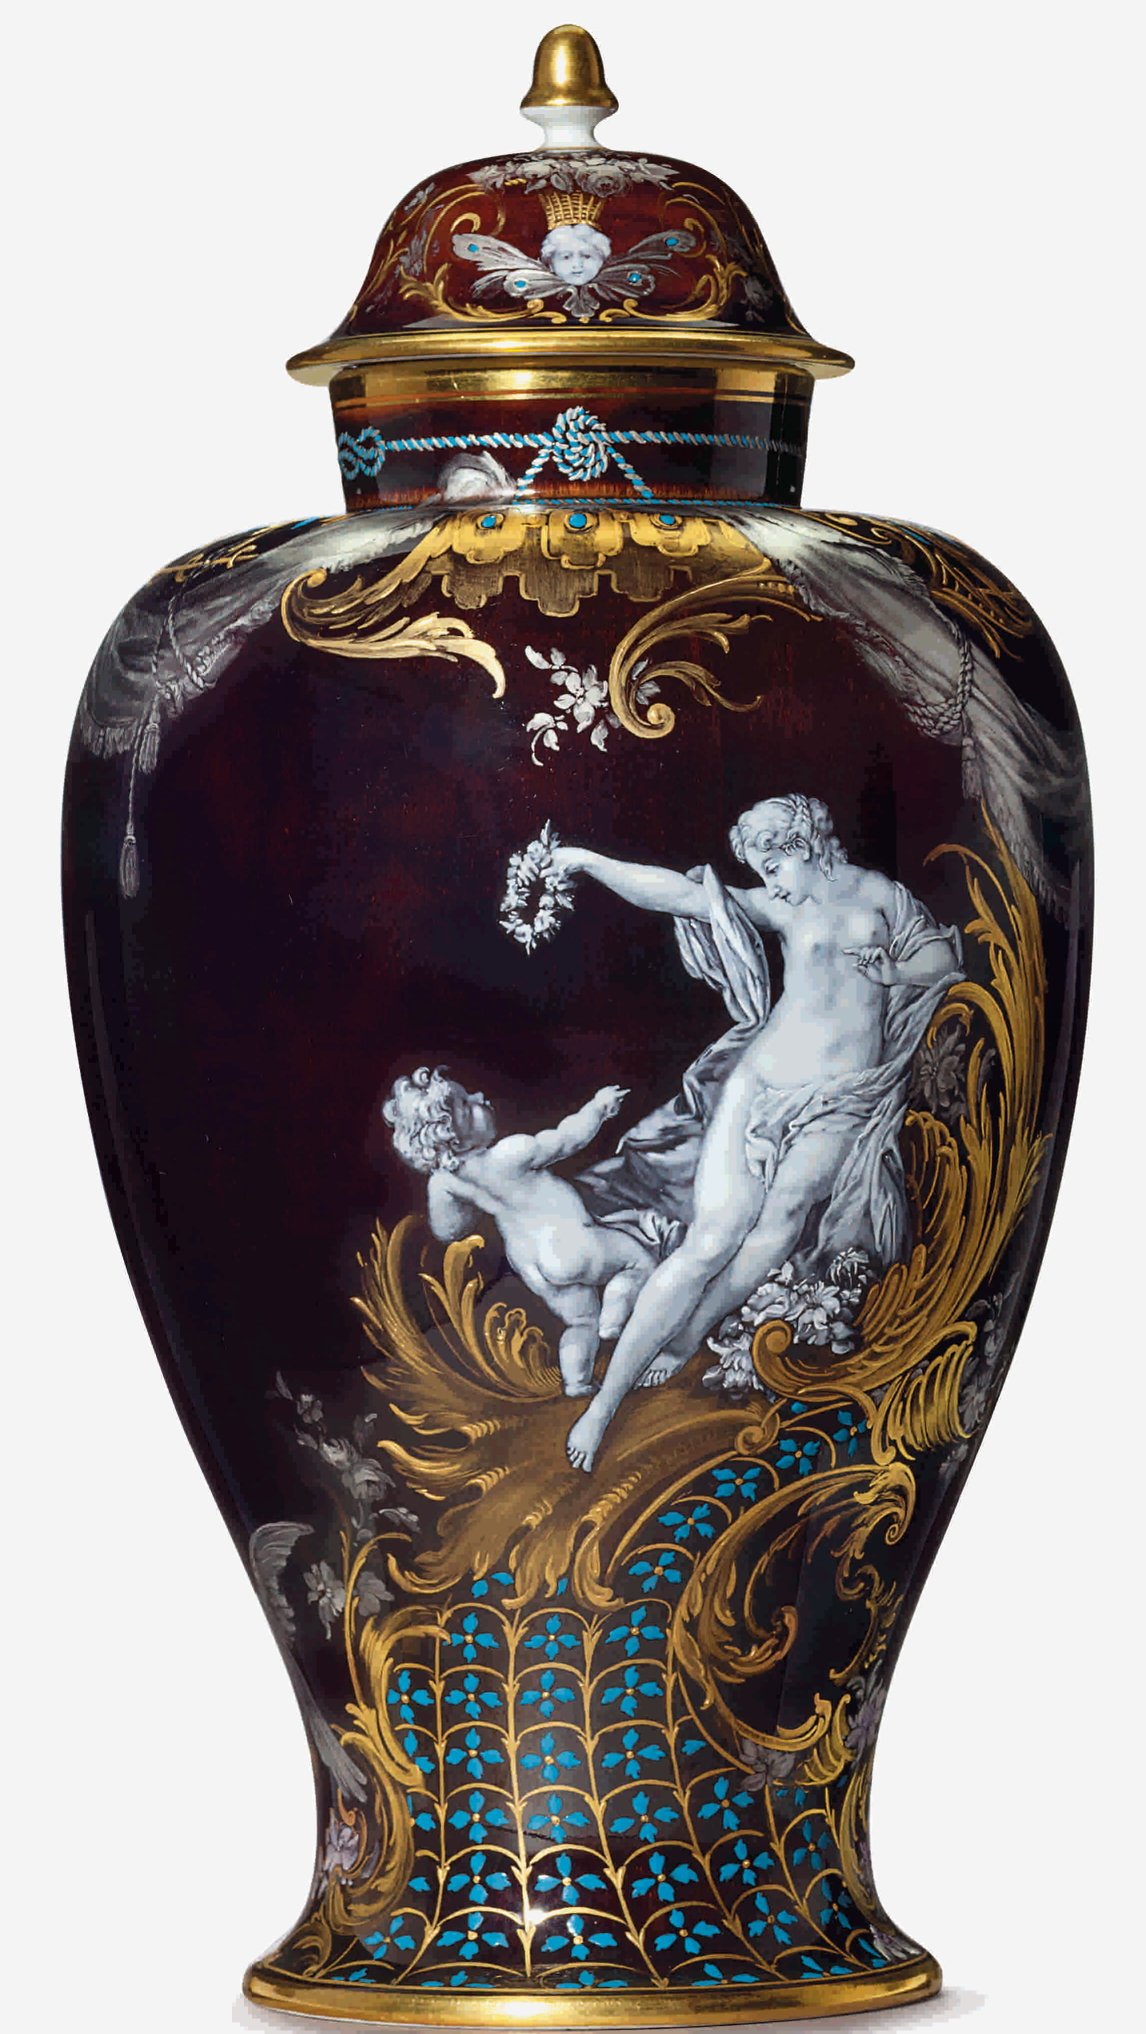 Meissen Vases Free Online Appraisal Amp Price Guide Meissen Vases